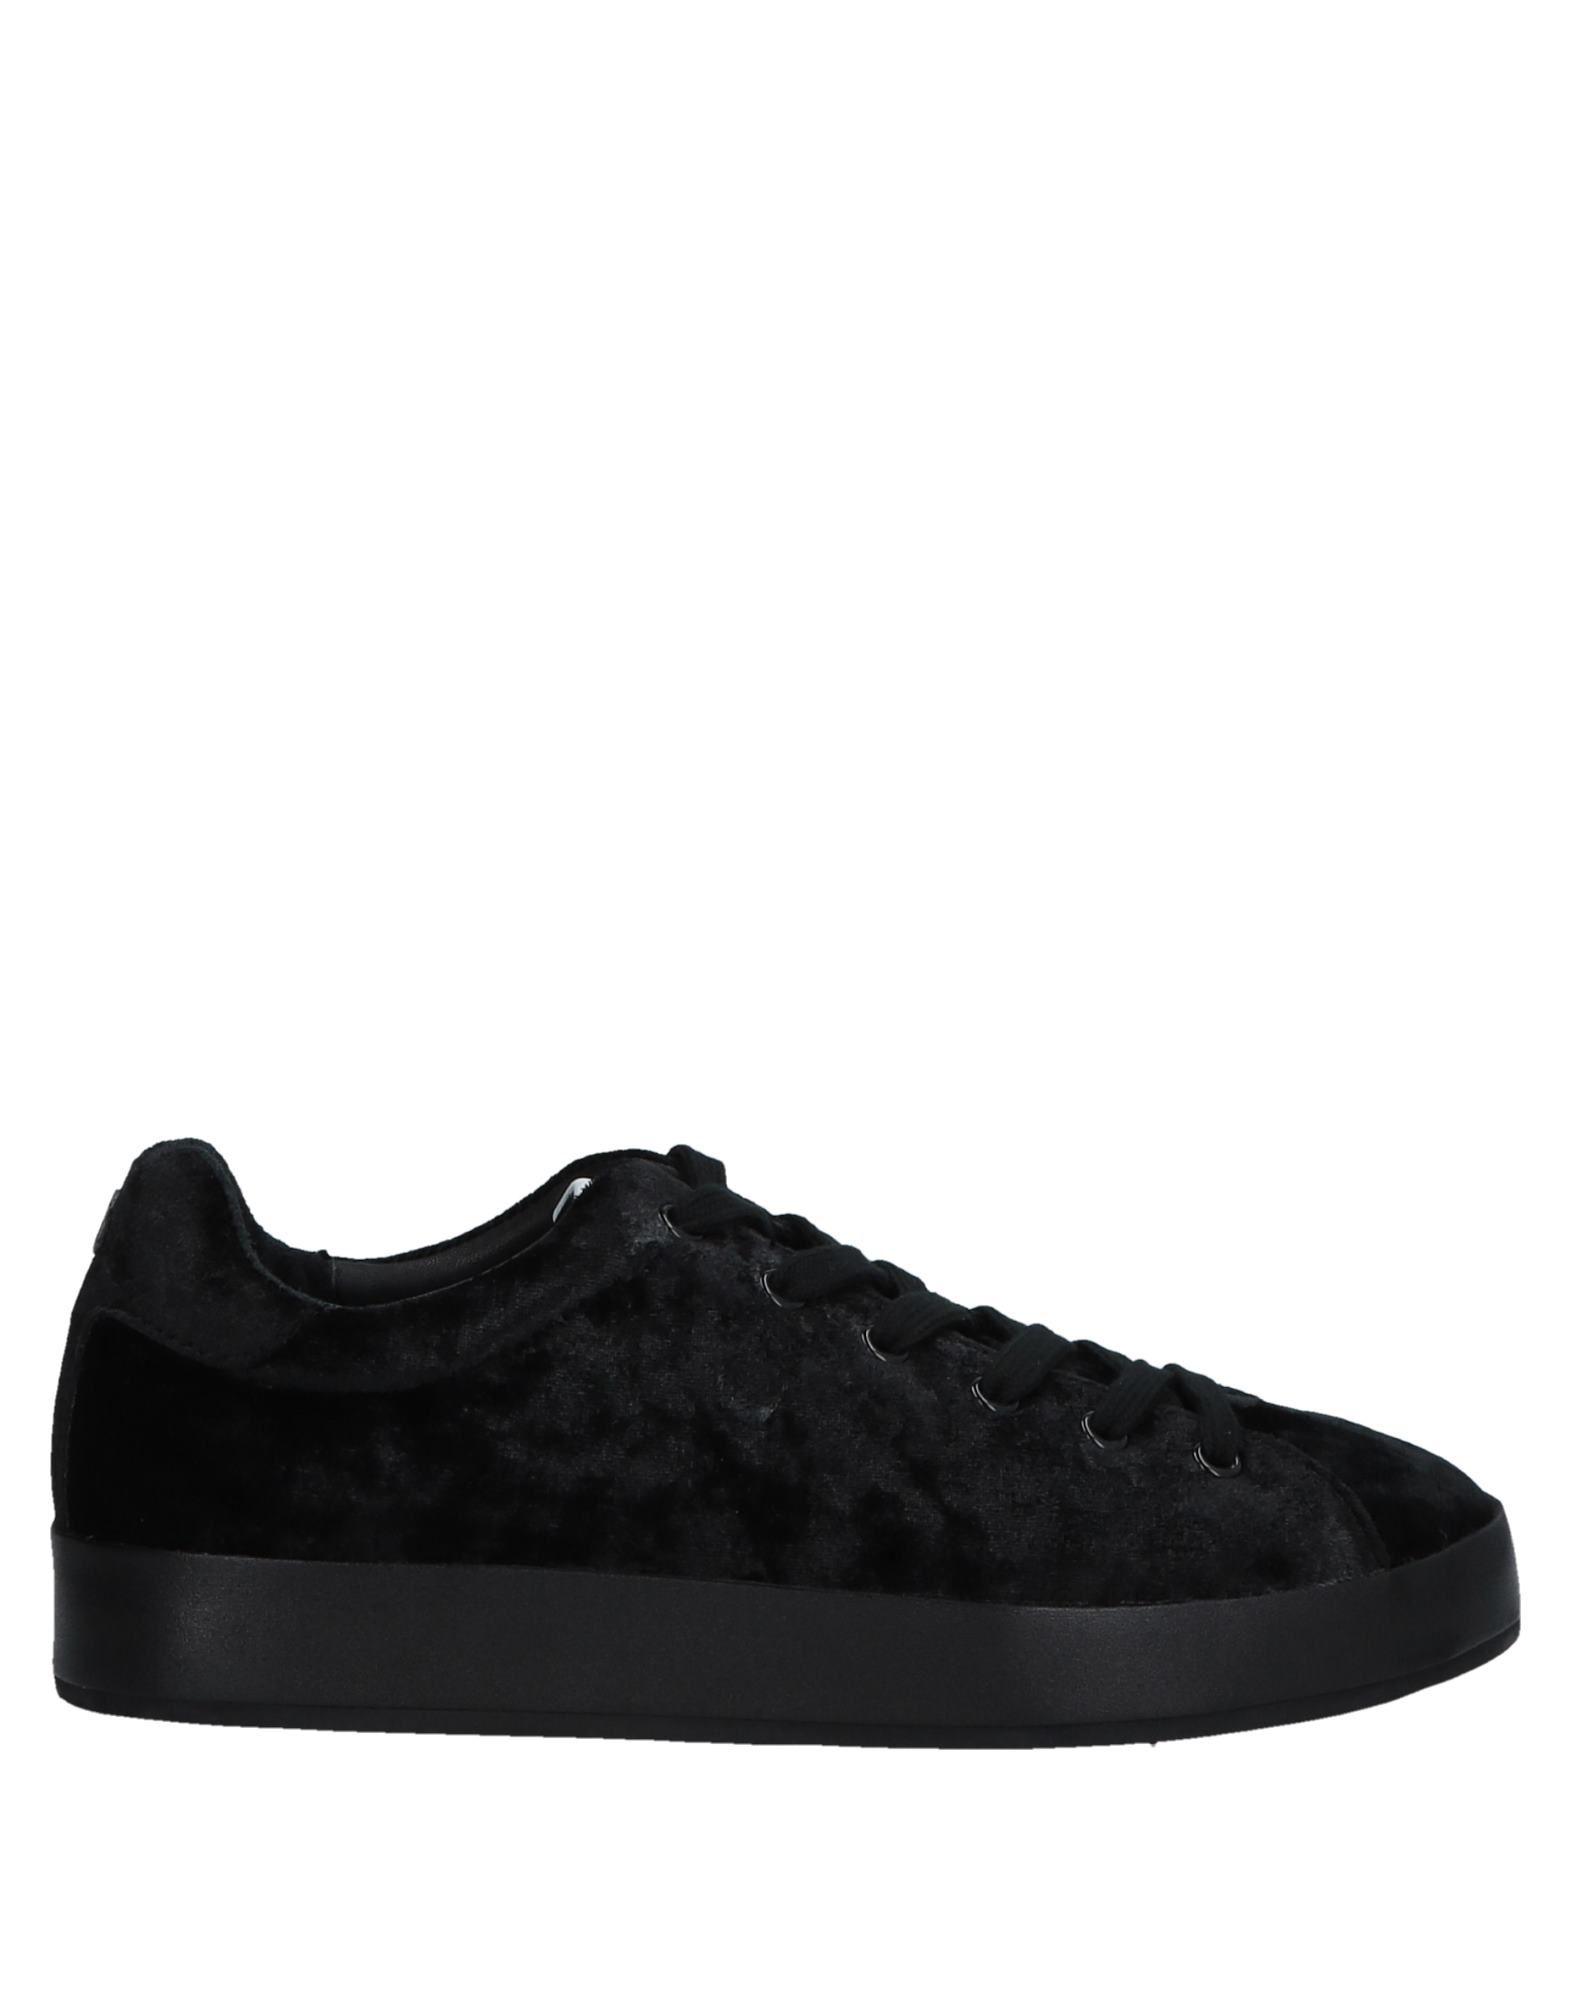 Rag & Bone Sneakers Damen  11572420OUGut aussehende strapazierfähige Schuhe